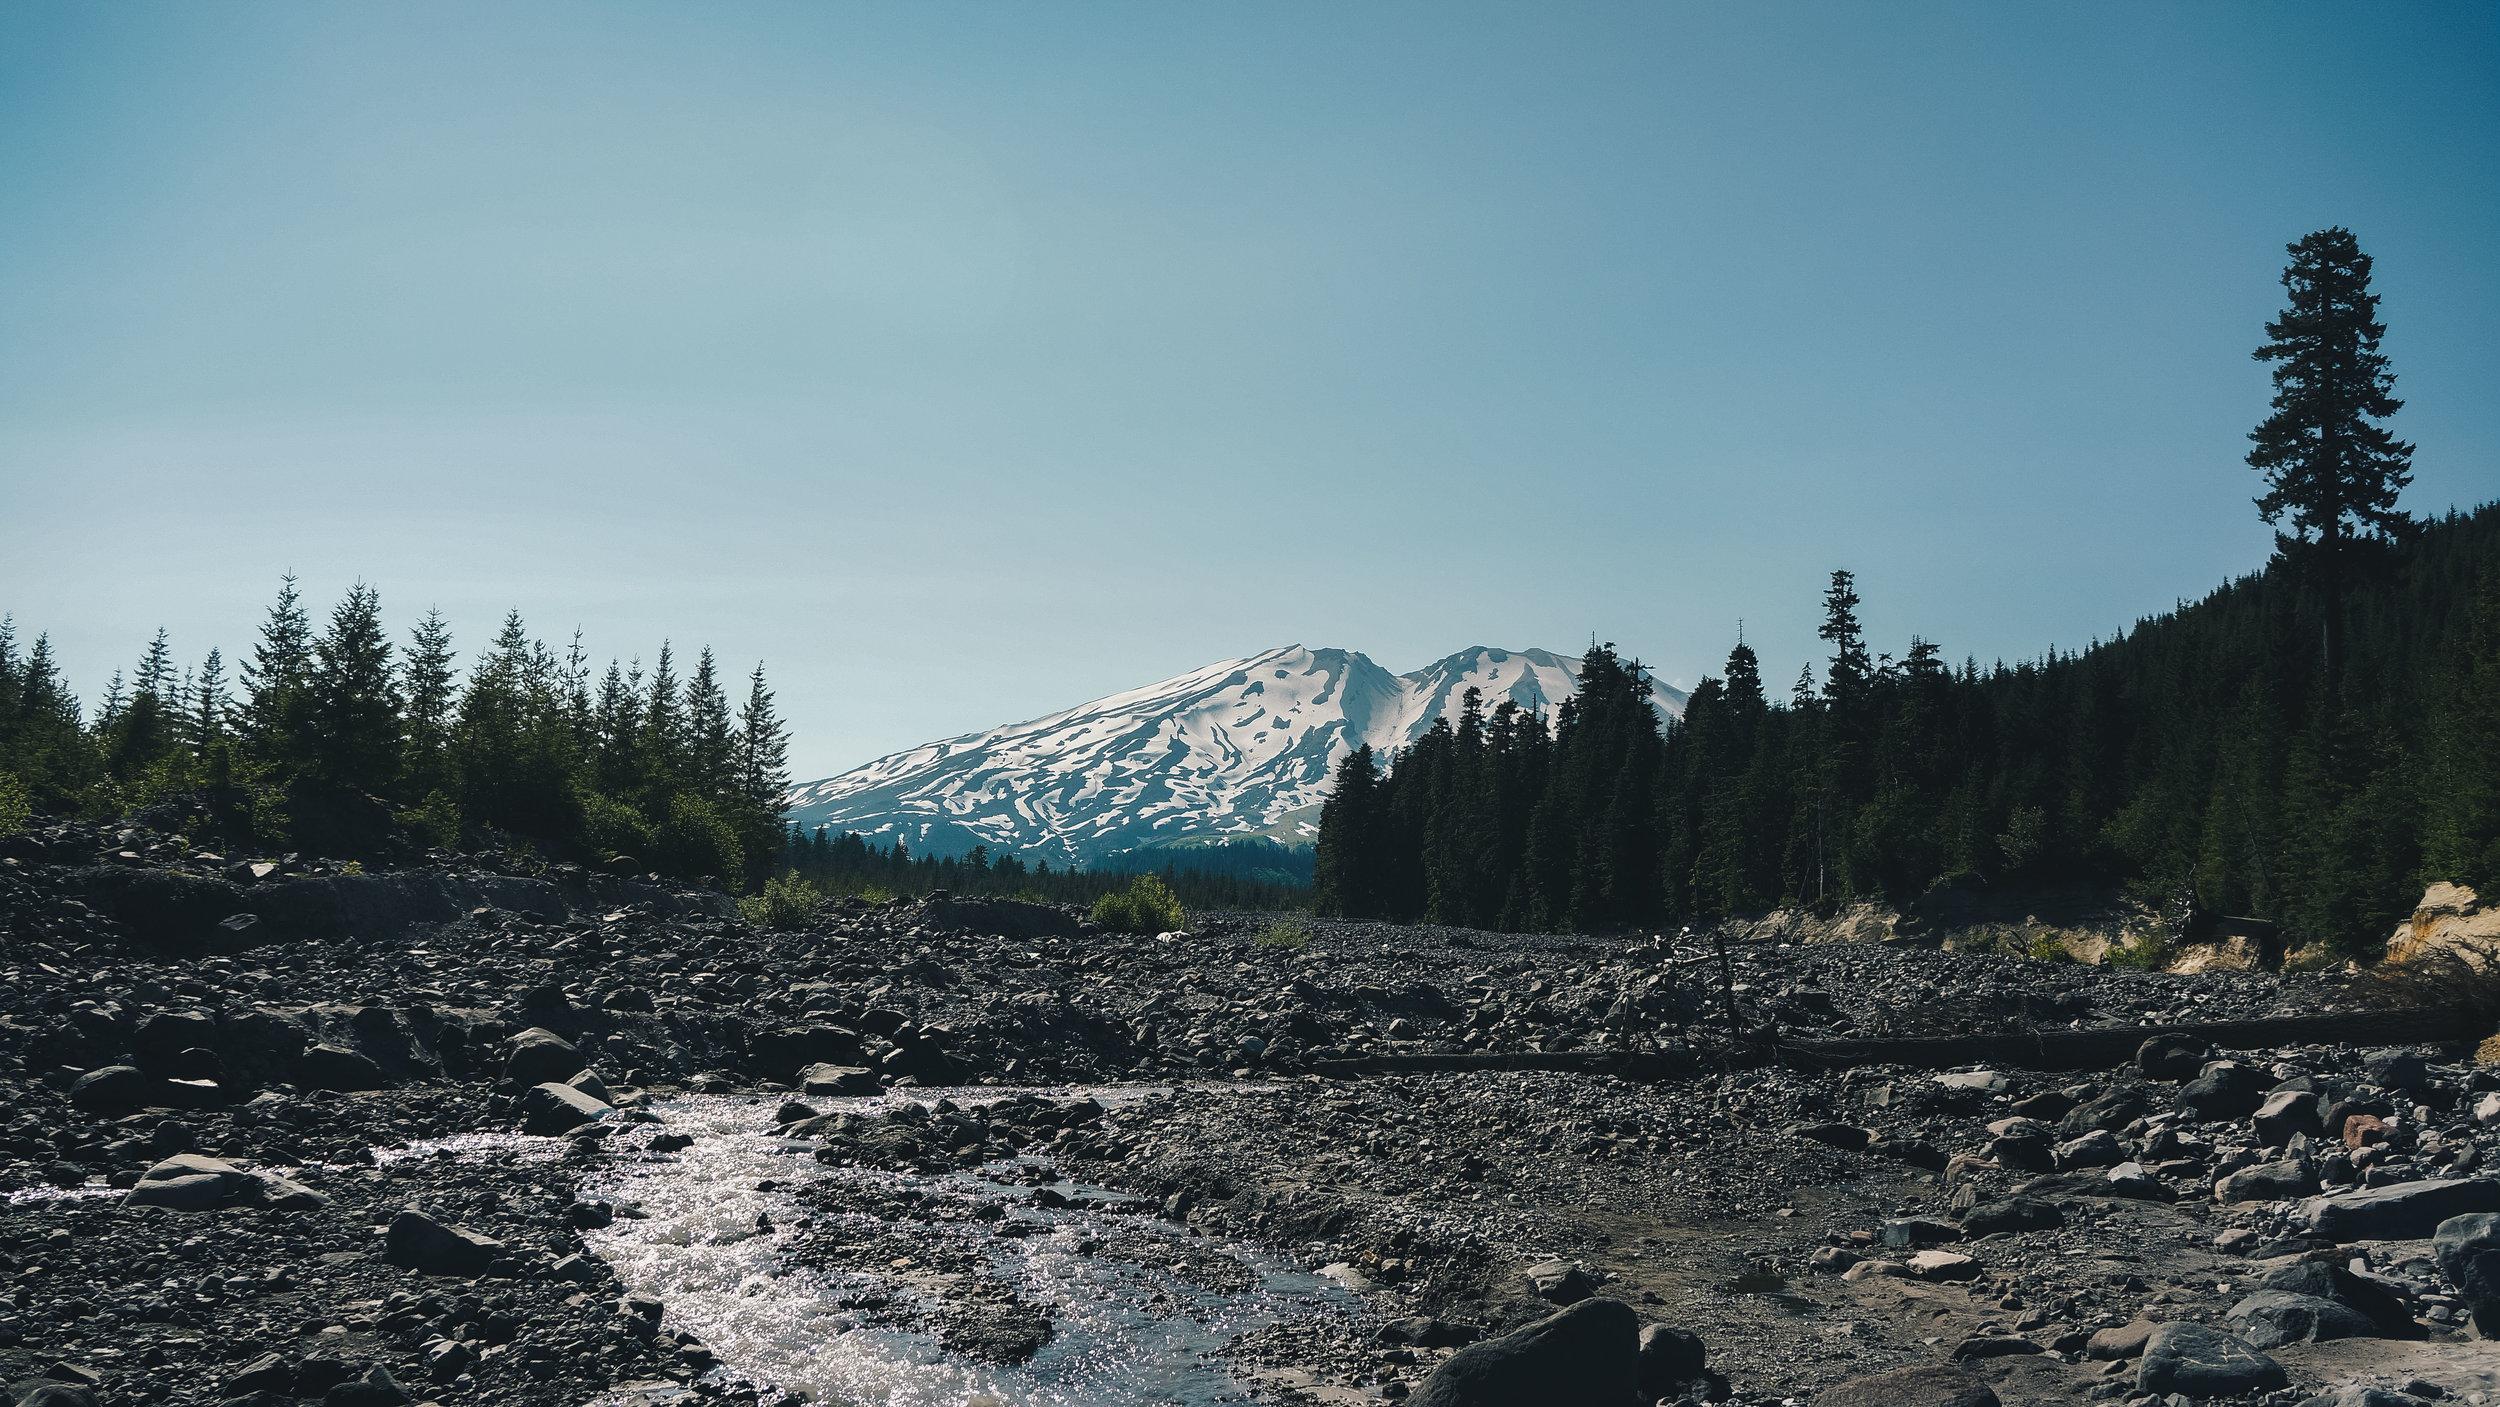 Mt. Saint Helens near Gifford Pinchot N.F.